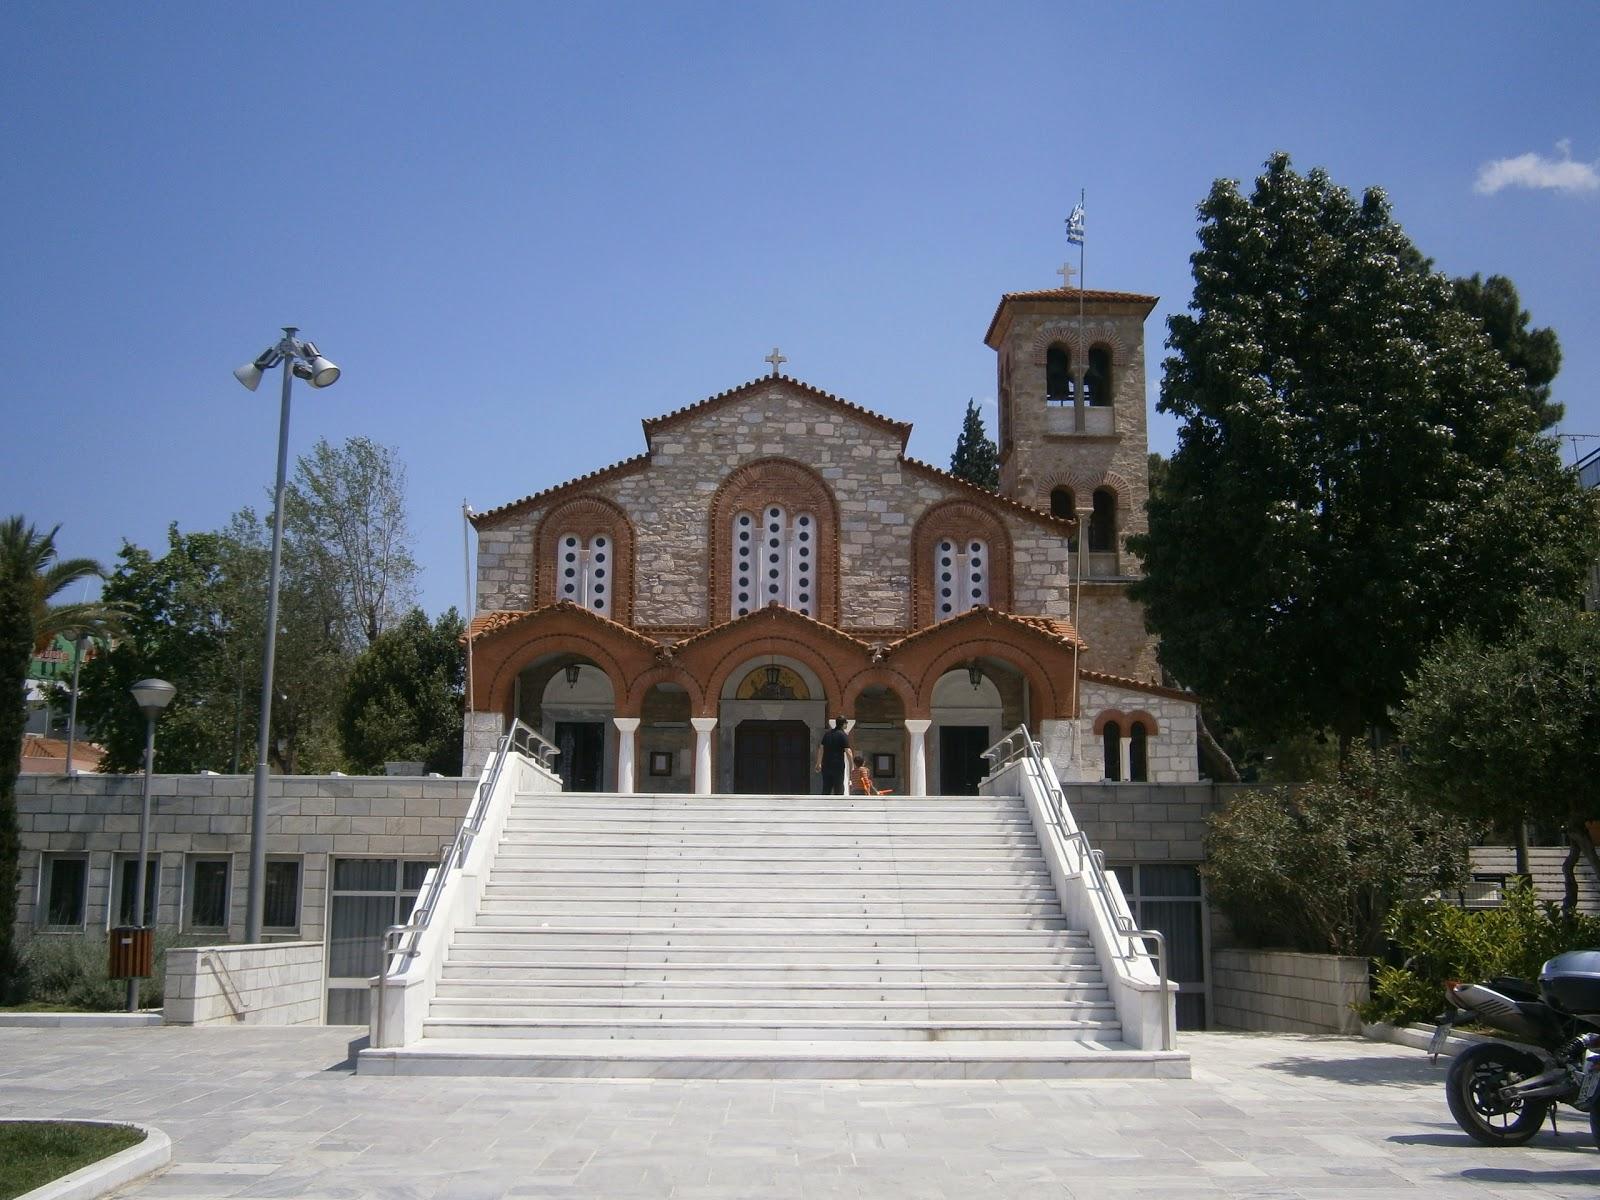 f74b35692c Οδός Ελλήνων  Φωτογραφίες από το ναό του αγίου Νικολάου στο Χαλάνδρι ...